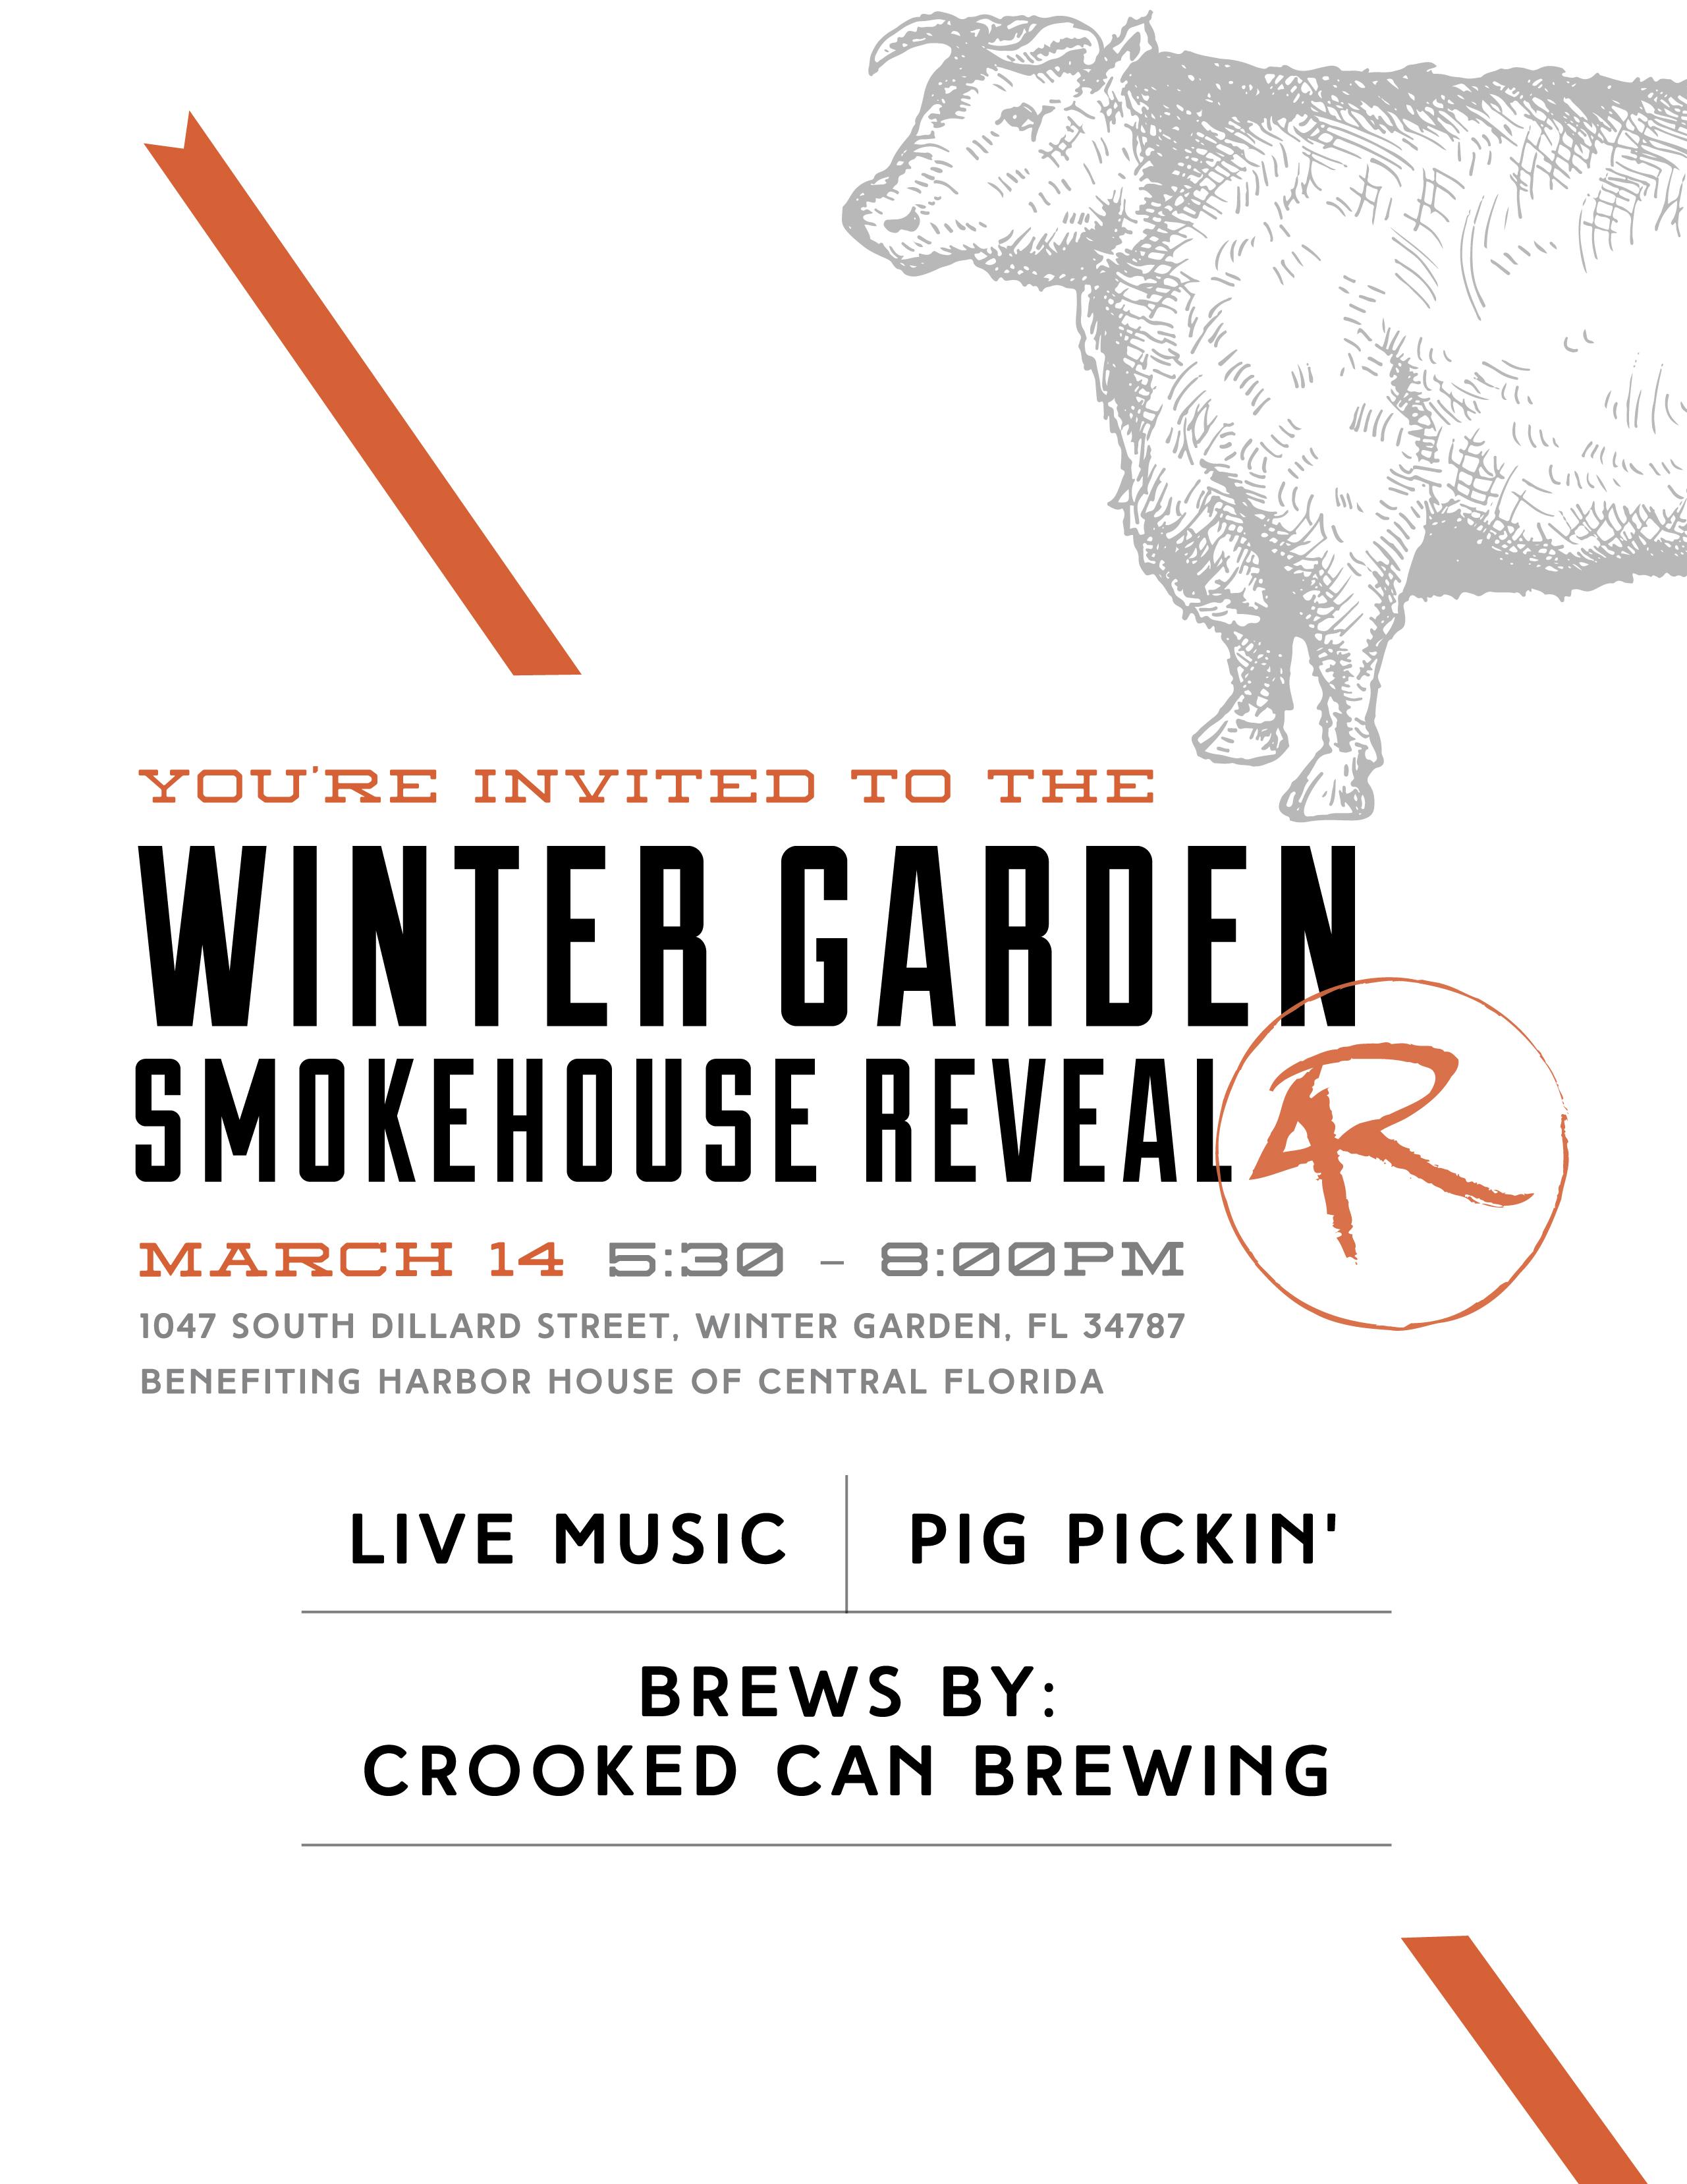 4rivers winter garden smokehouse reveal tickets tue mar 14 2017